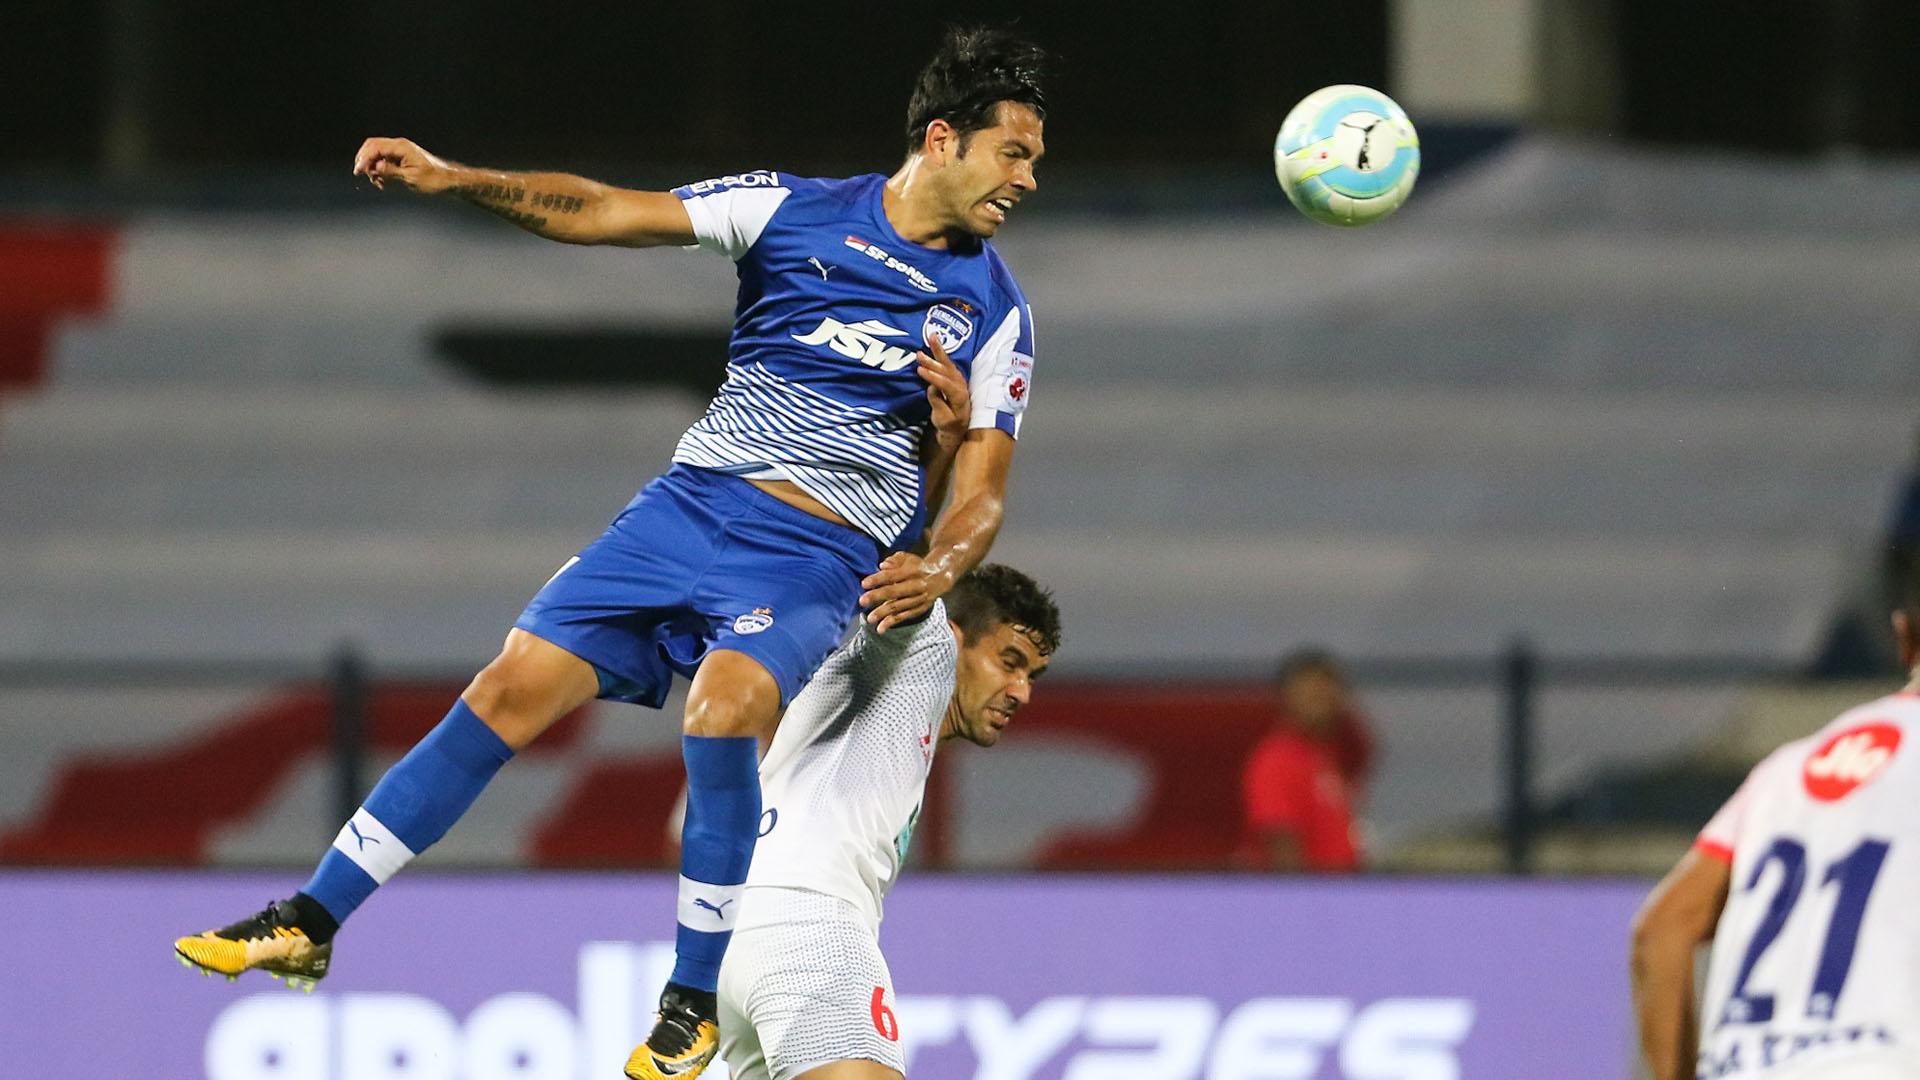 Miku Bengaluru FC Delhi Dynamos FC ISL season 4 2017/2018